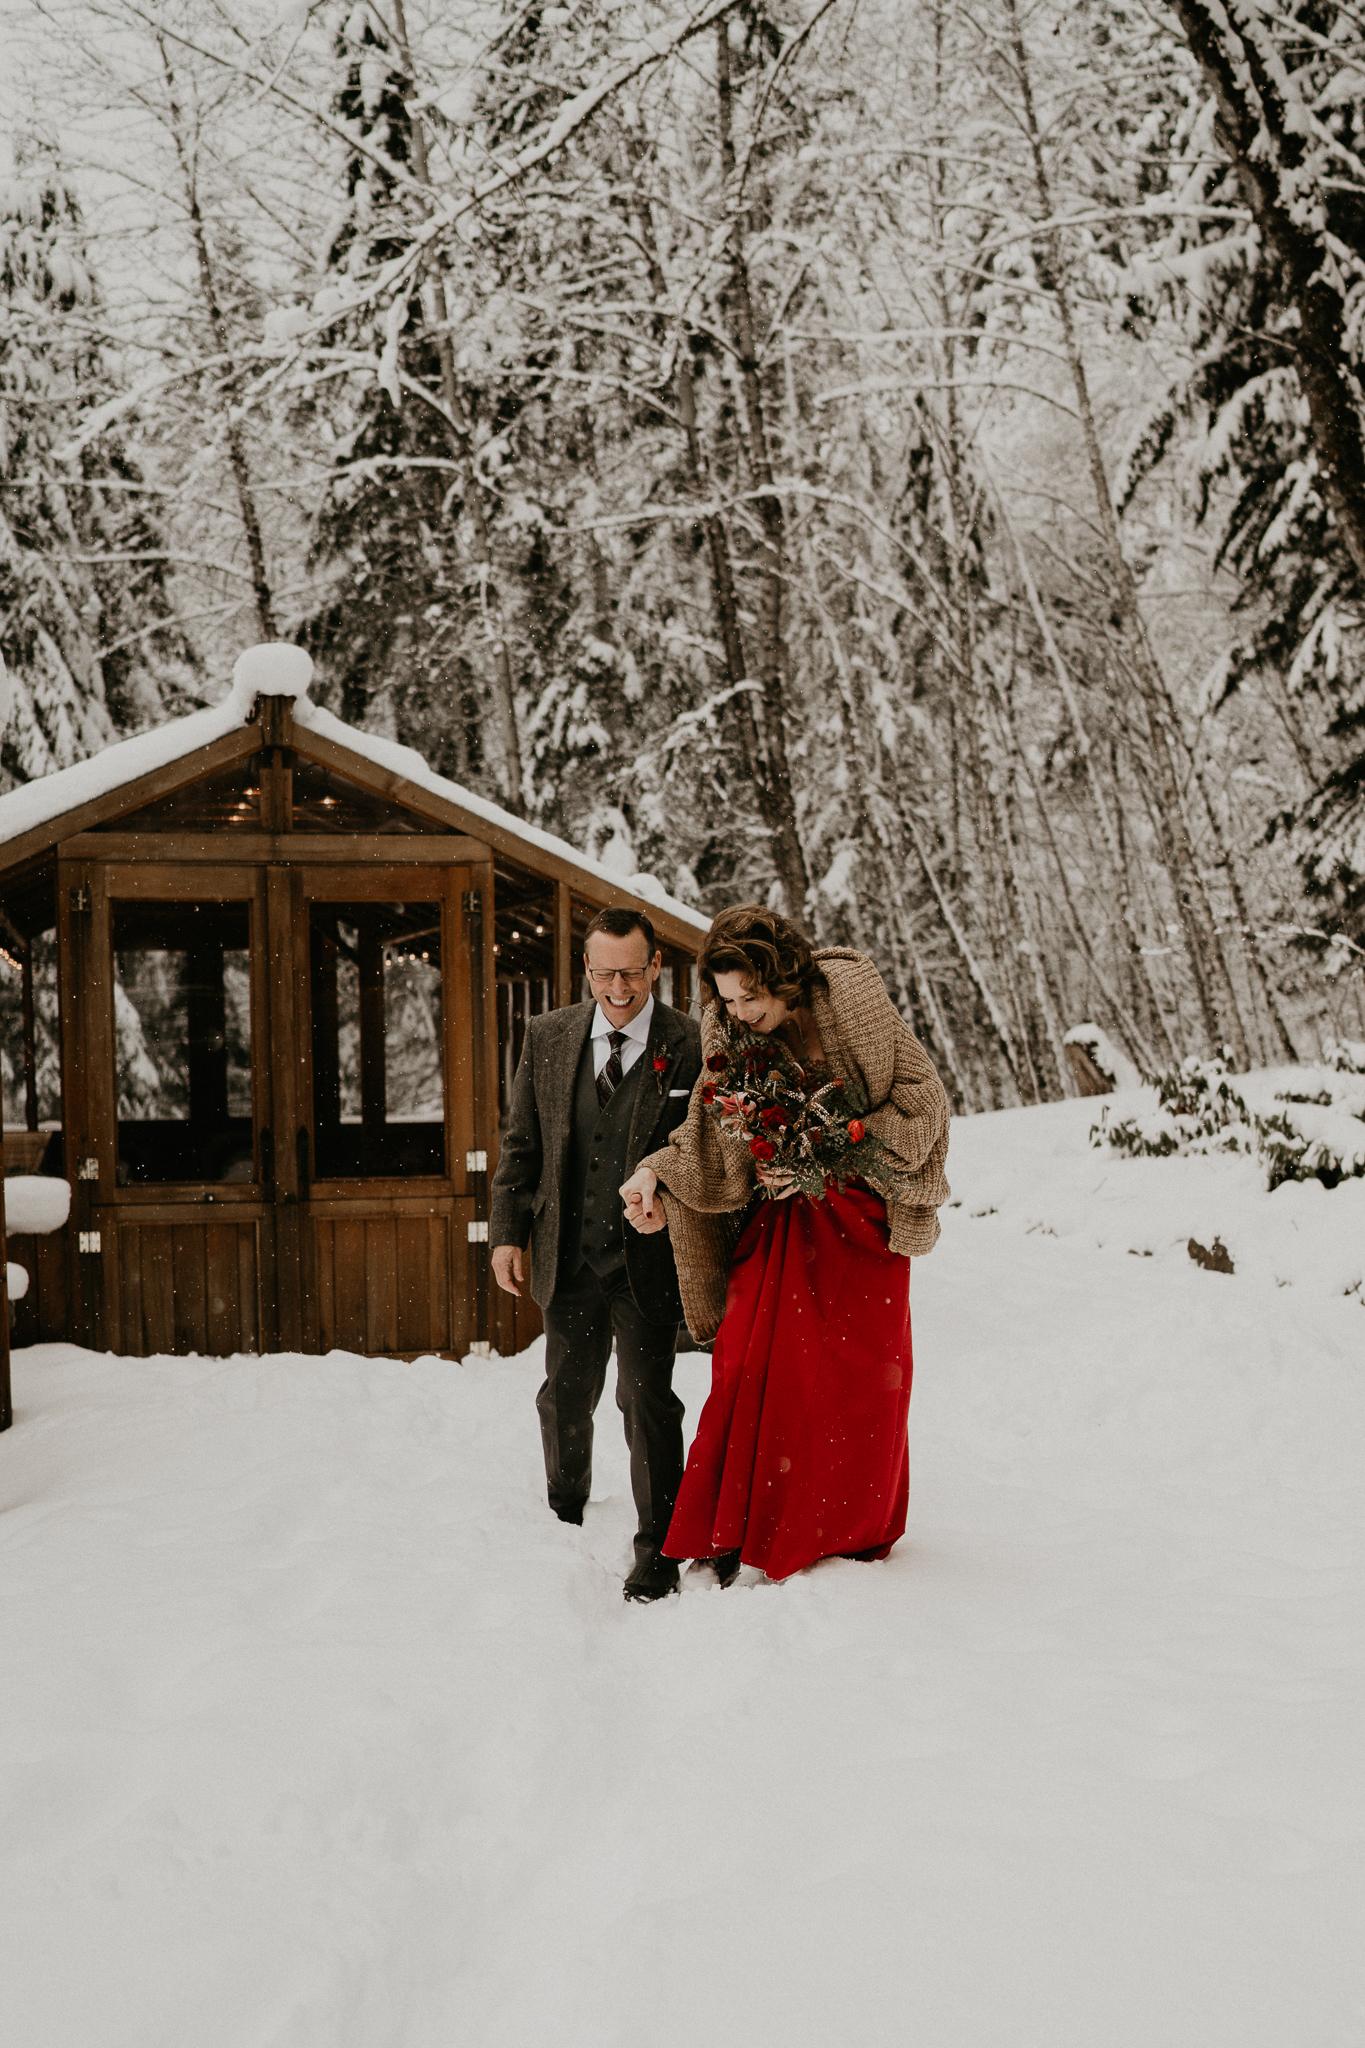 Mount-Rainier-Snow-Winter-Elopement-Adventure-Photographer2-22.jpg